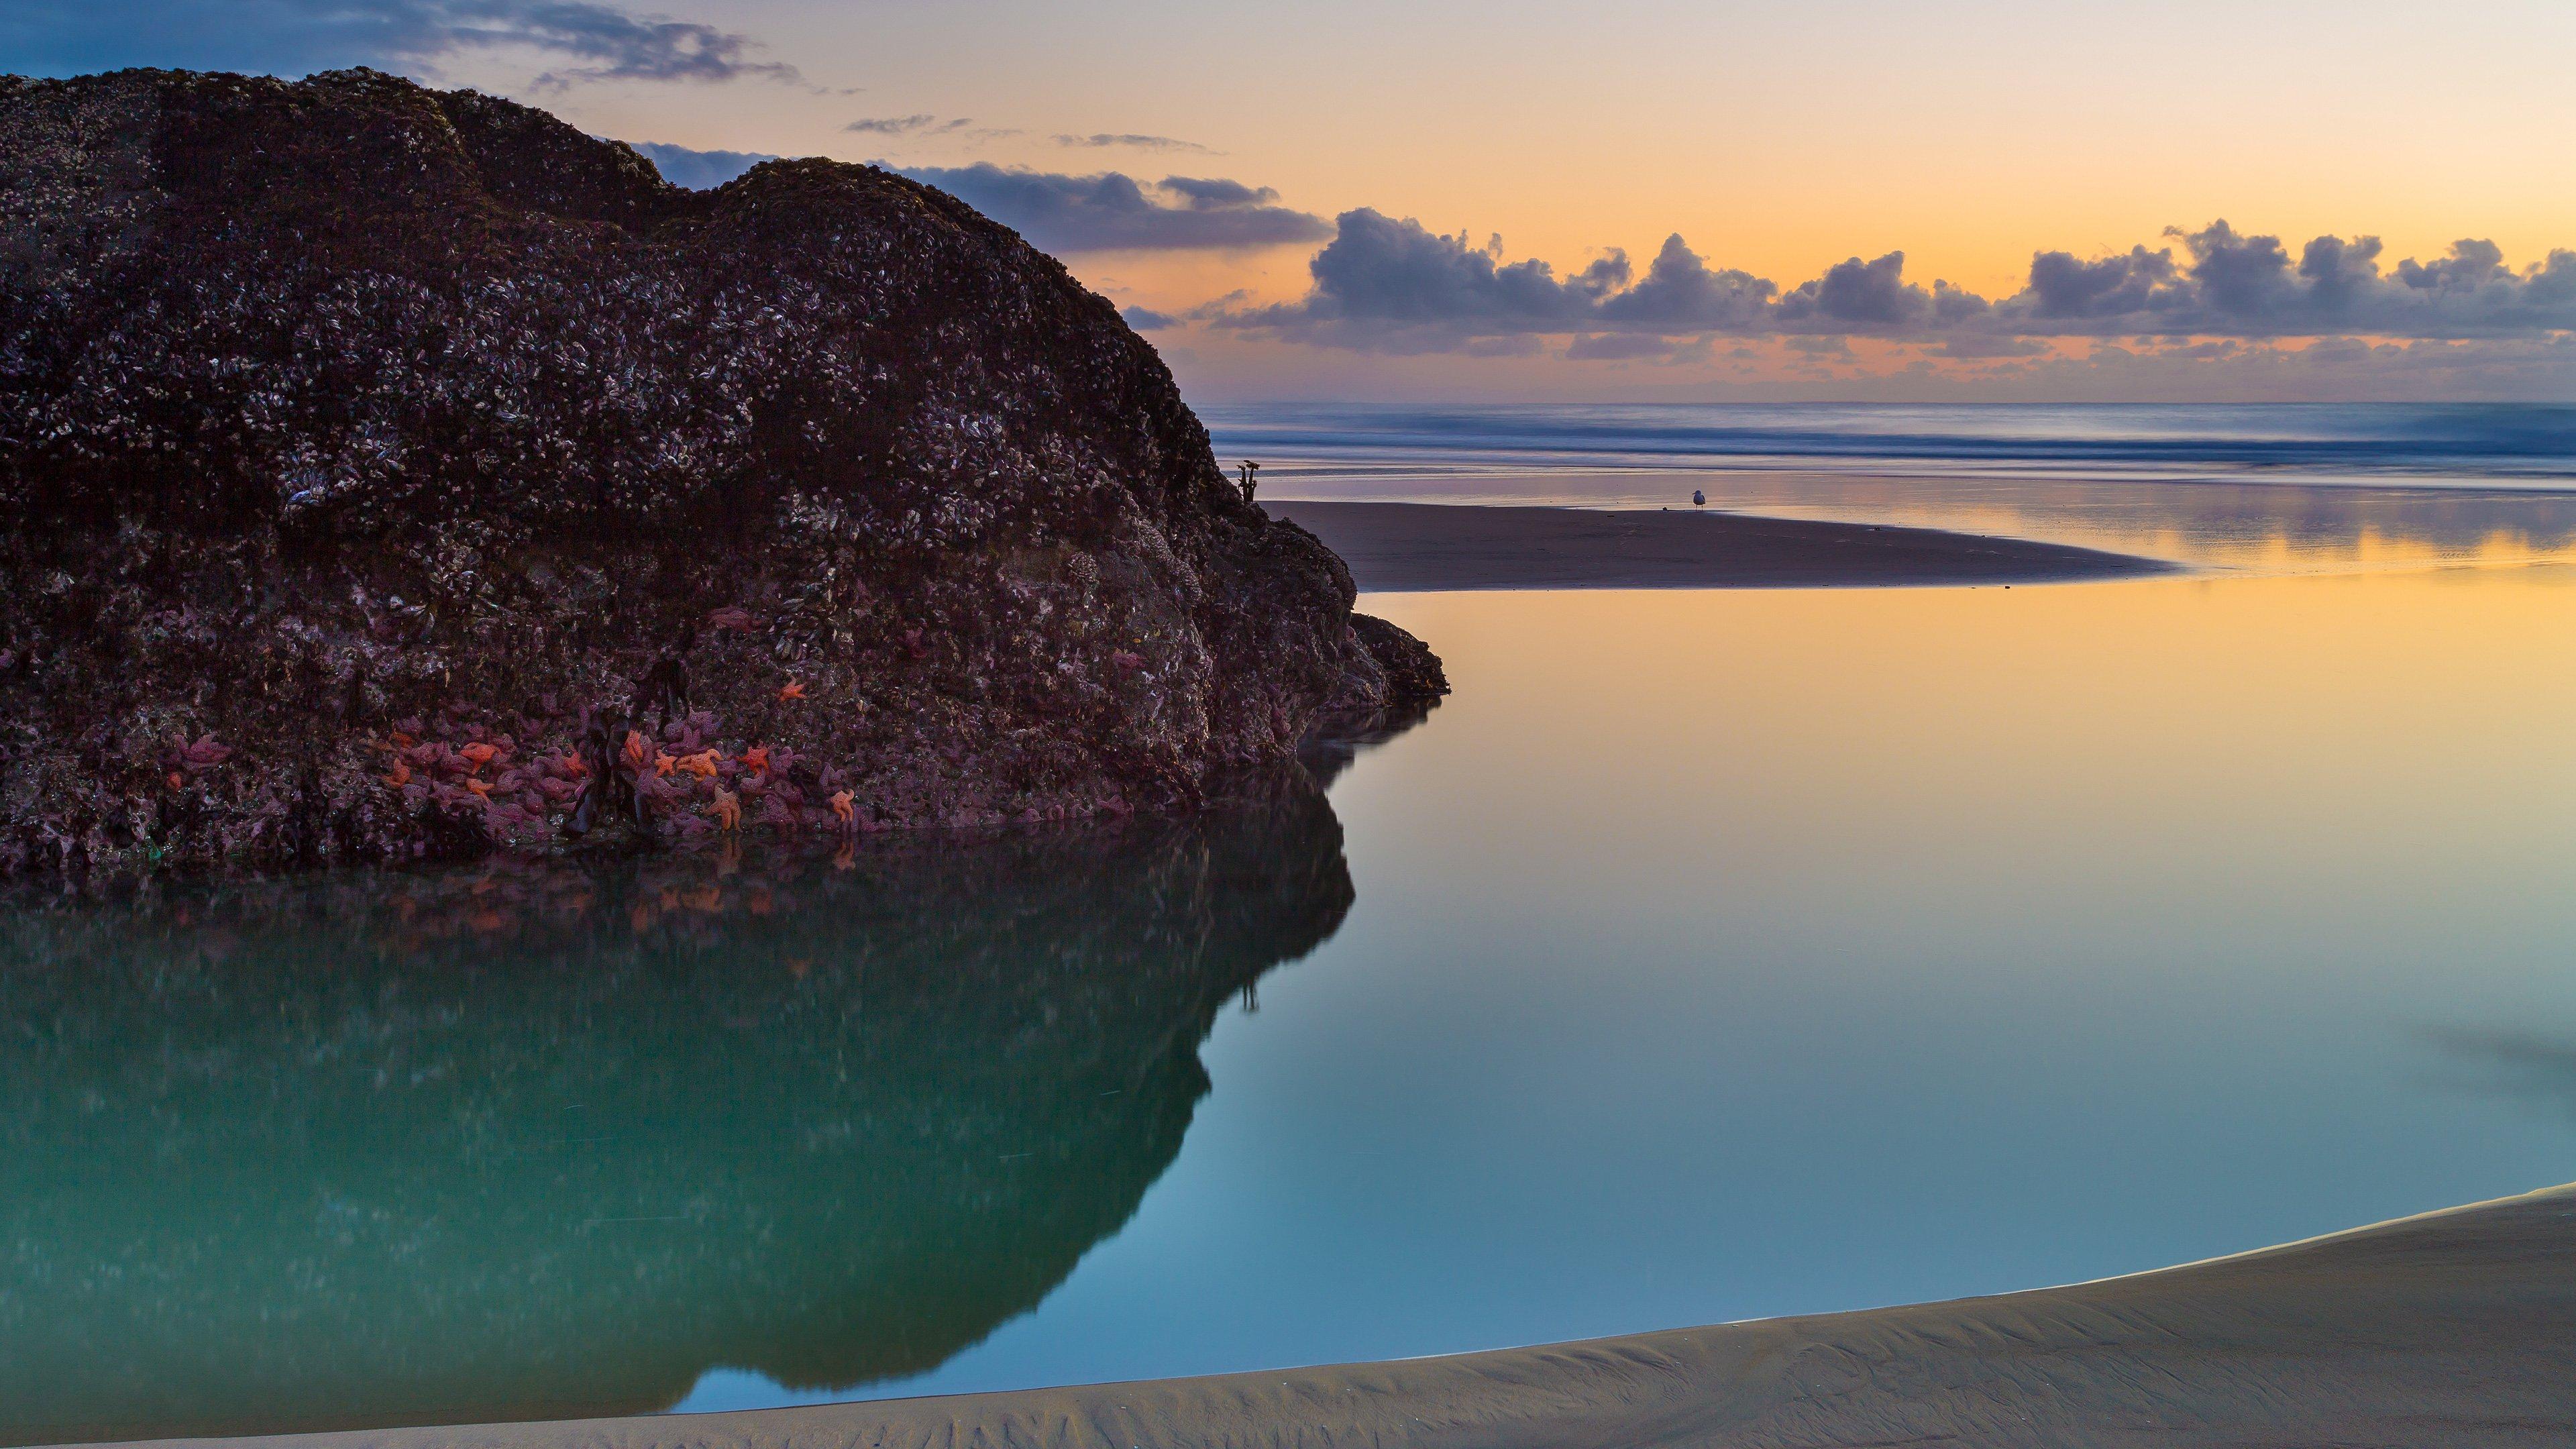 Wallpaper Bandon Beach at sunset